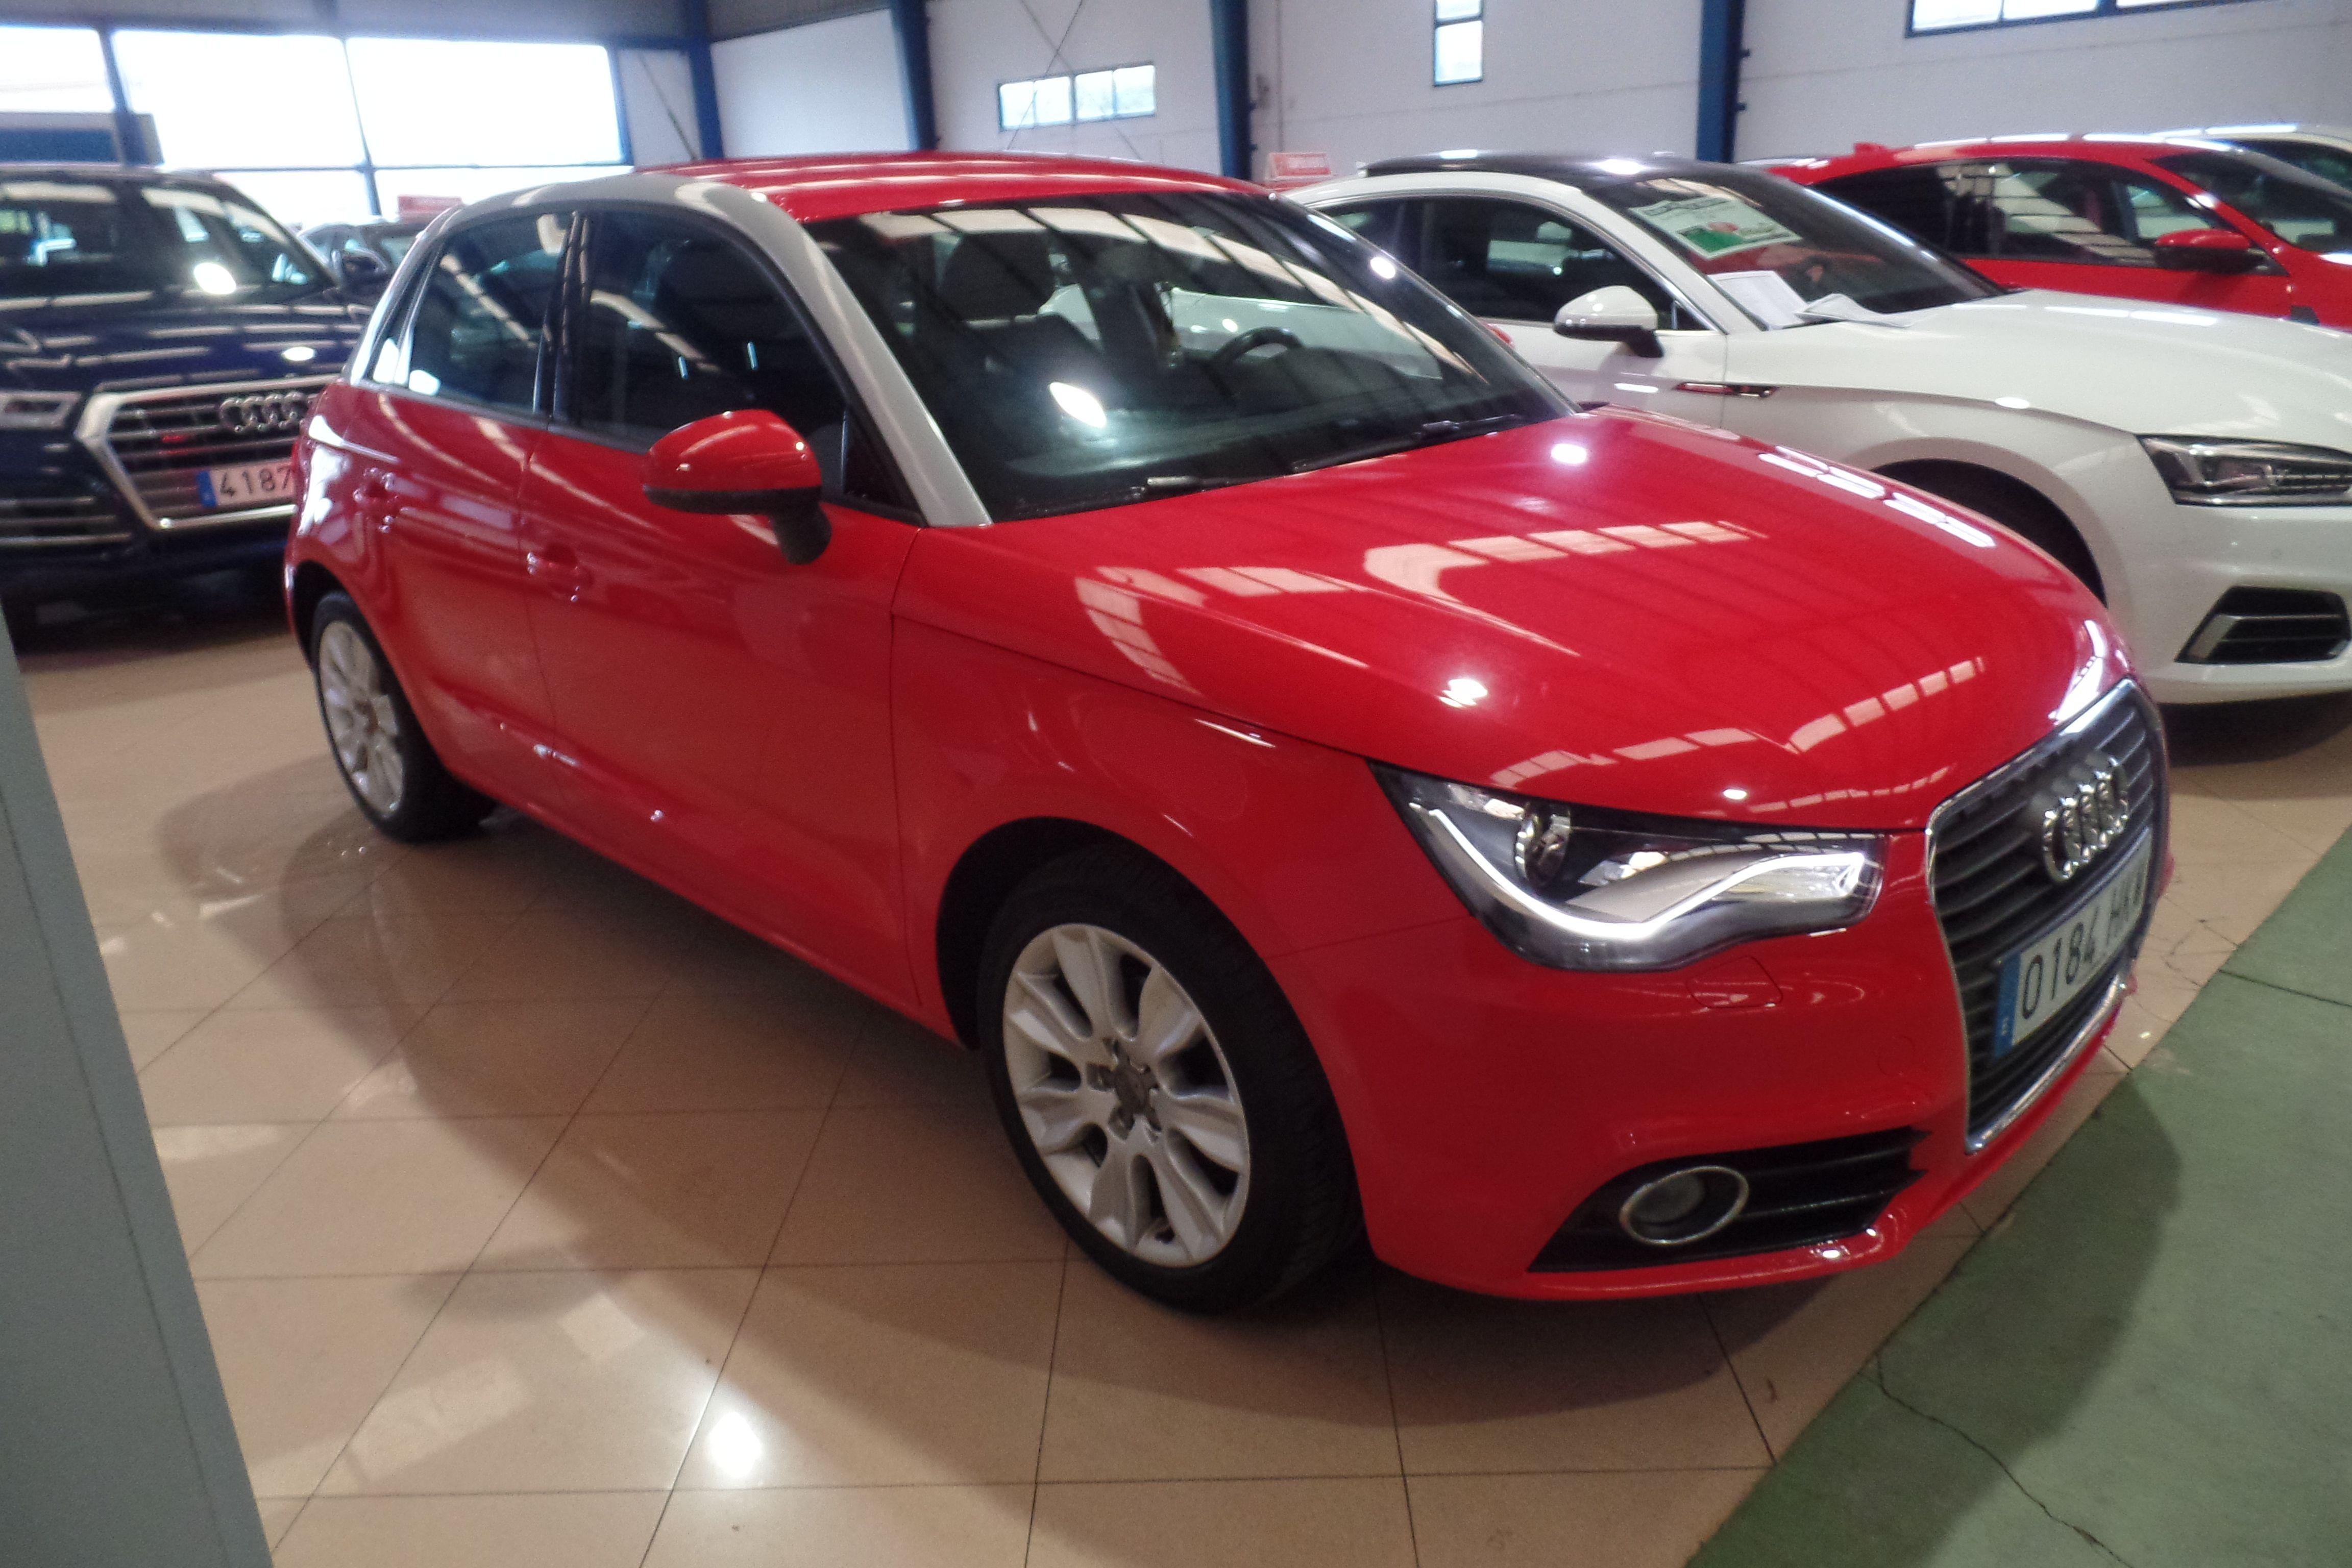 AUDI A1 Sportback 1.6 TDI 90cv S tronic Ambition (0184-HKM): Servicios Peugeot de Senra Sport